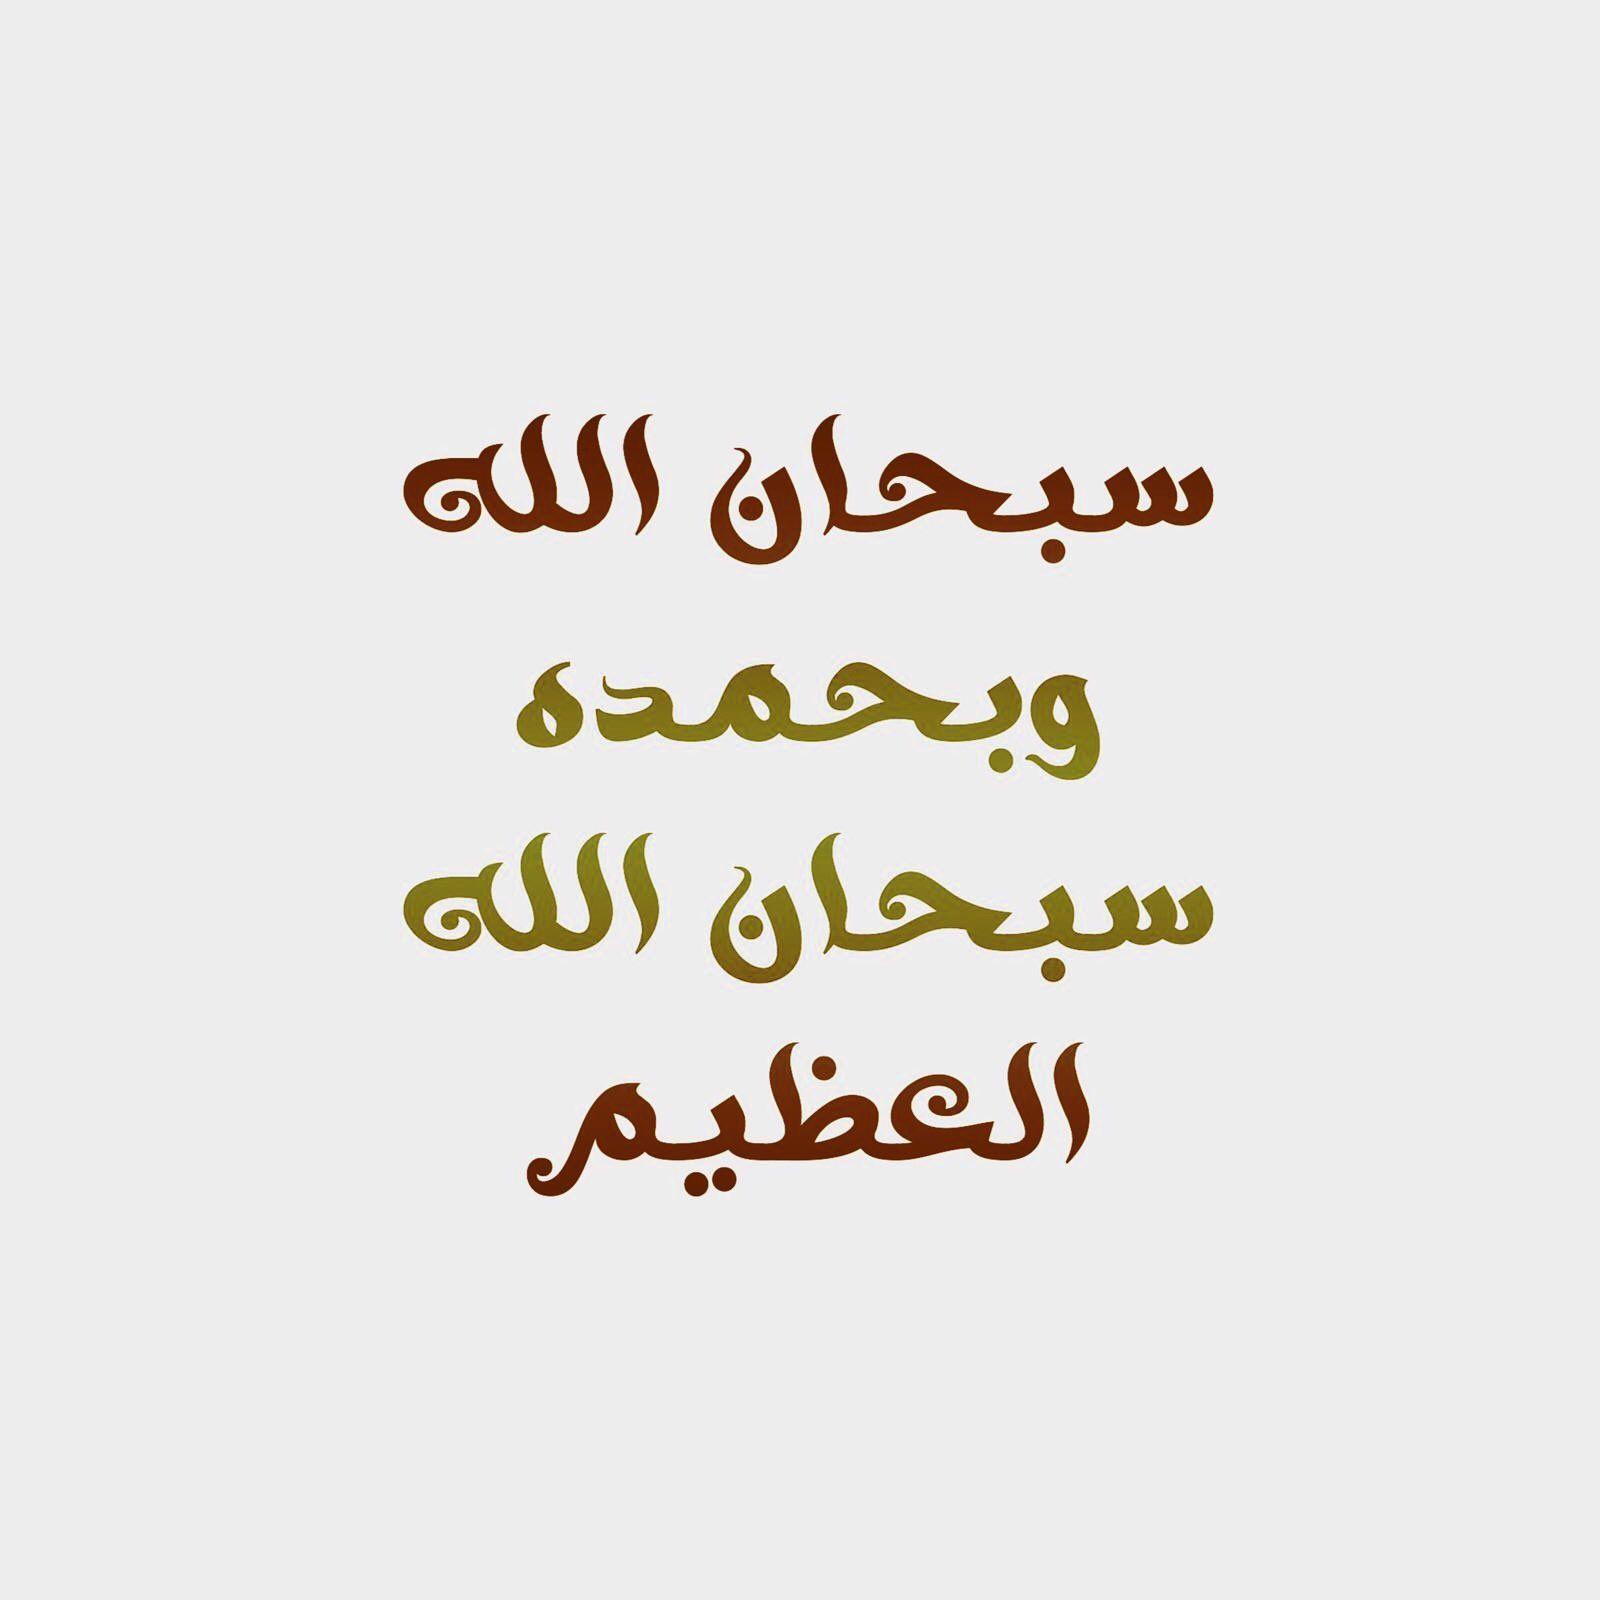 سبحان الله وبحمده سبحان الله العظيم Reminder Quotes Doa Islam Quotes